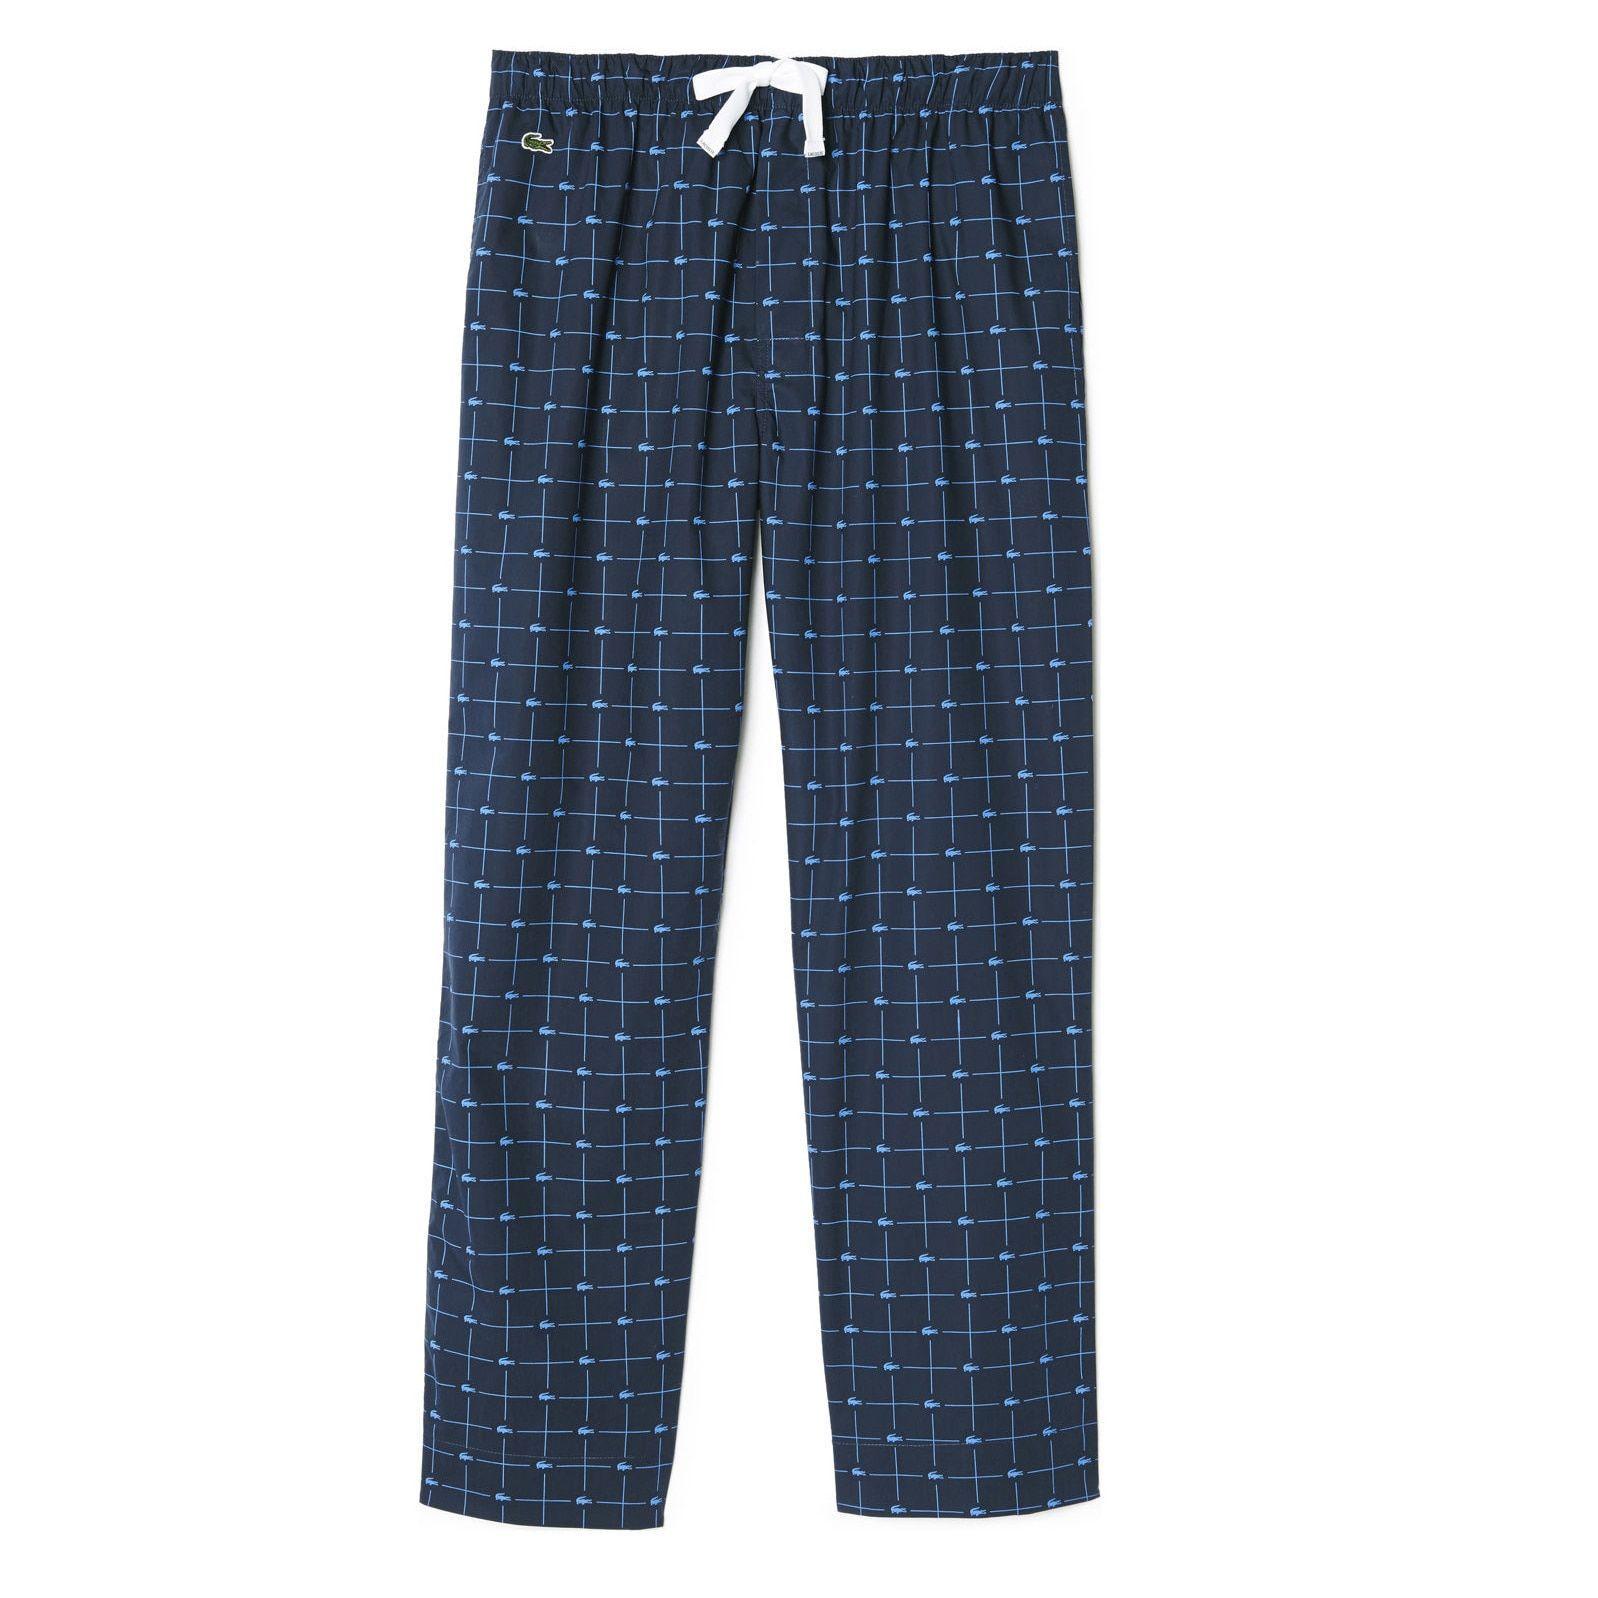 96a9bc0ca6 Lacoste Men's Croc-print Navy Lounge Sleep Pants | lacoste | Mens ...